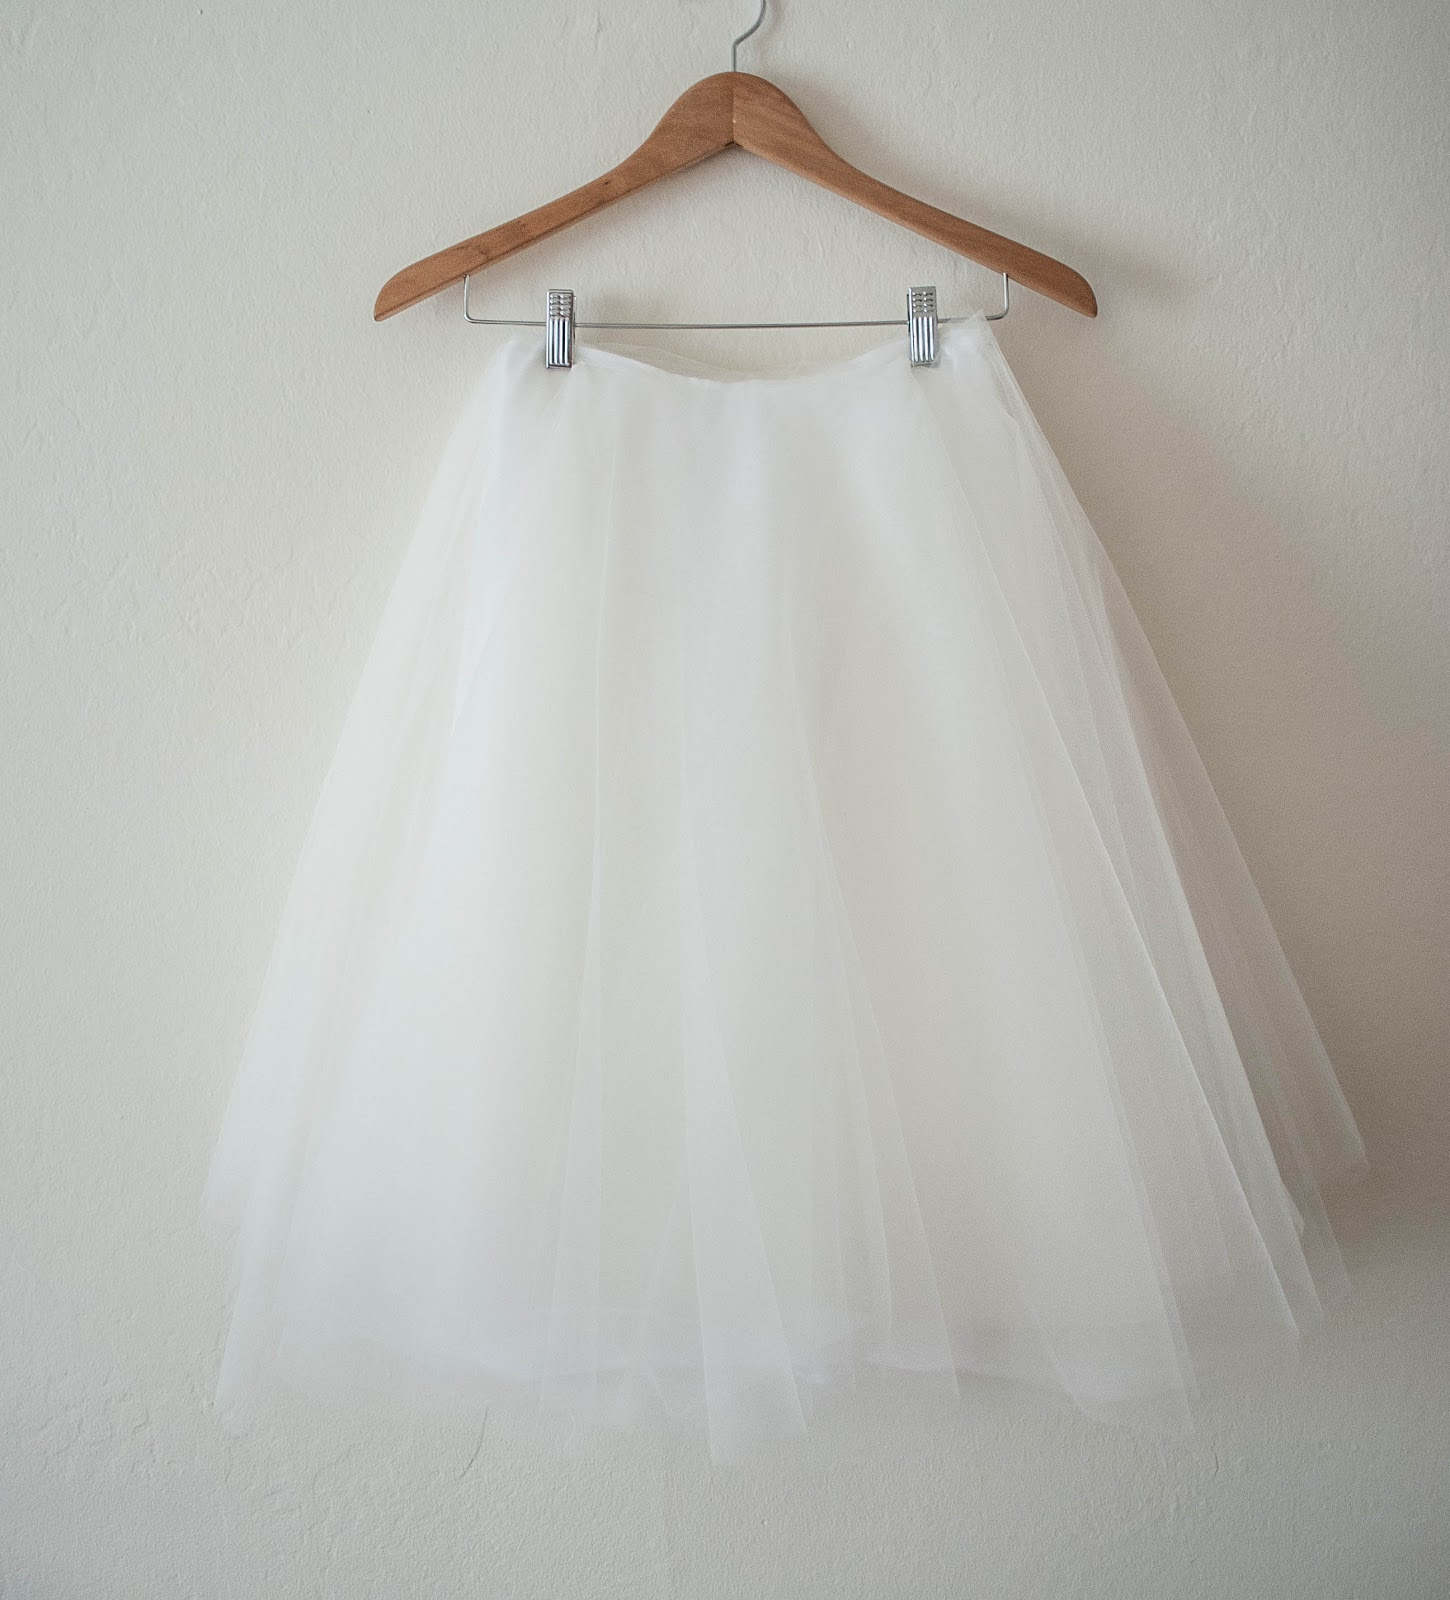 Make A Long Skirt 3